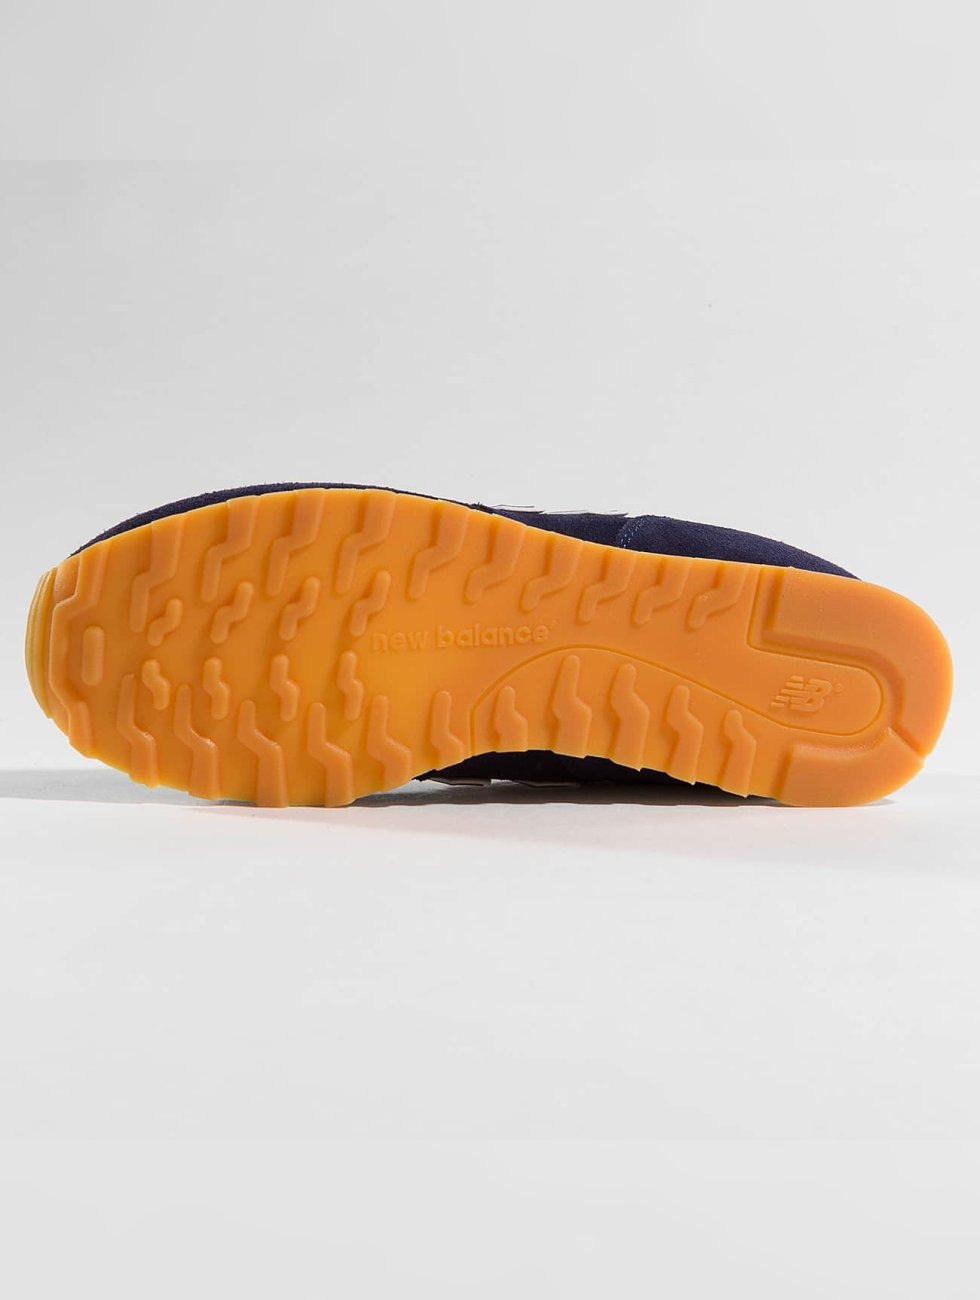 Nouvelle Chaussure Balance / Baskets Ml373 D Nrg En Bleu 421 510 extrêmement 1ik0xd